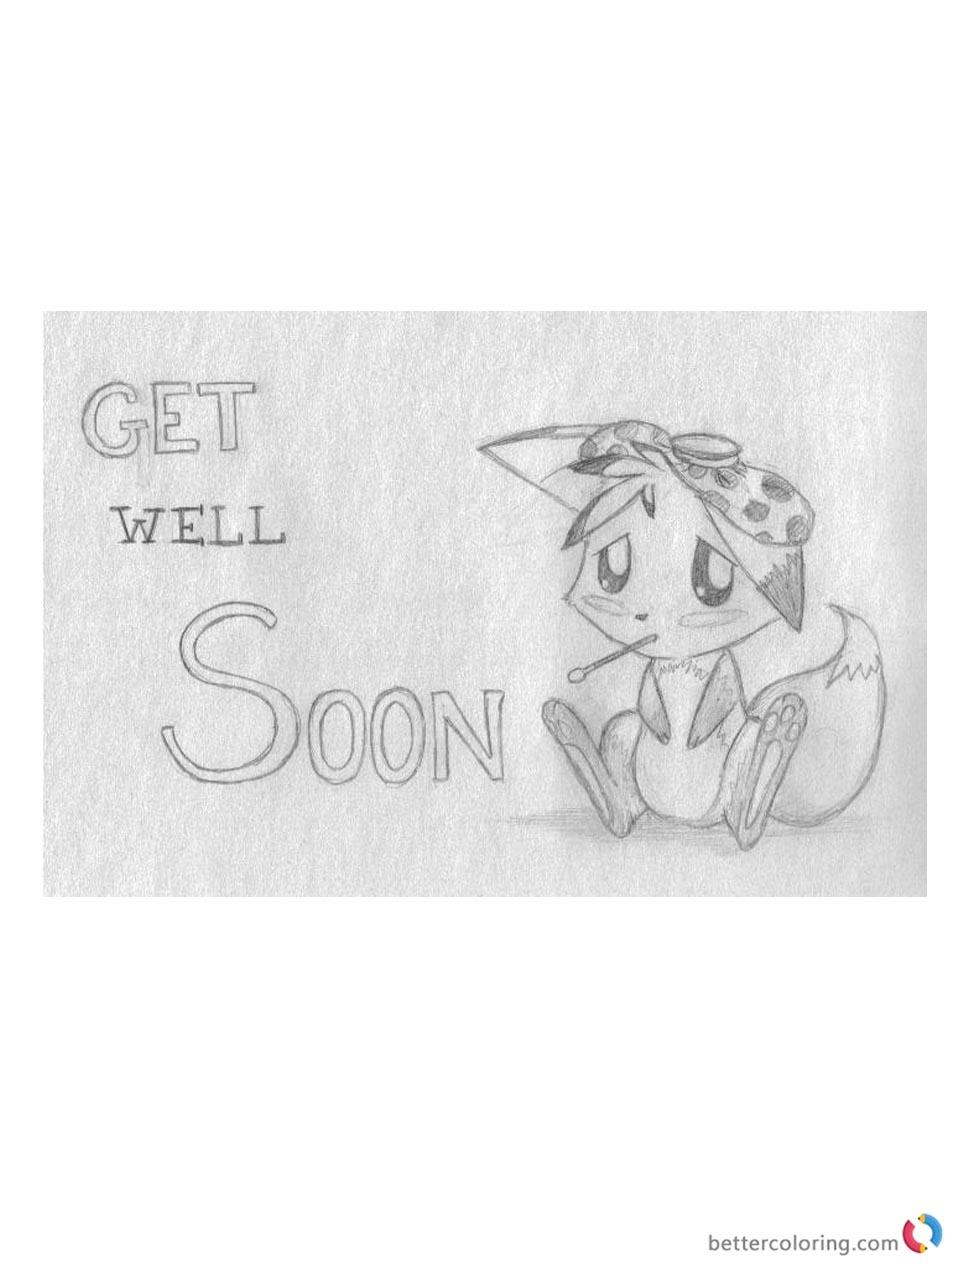 Fullsize Of Get Well Soon Cute